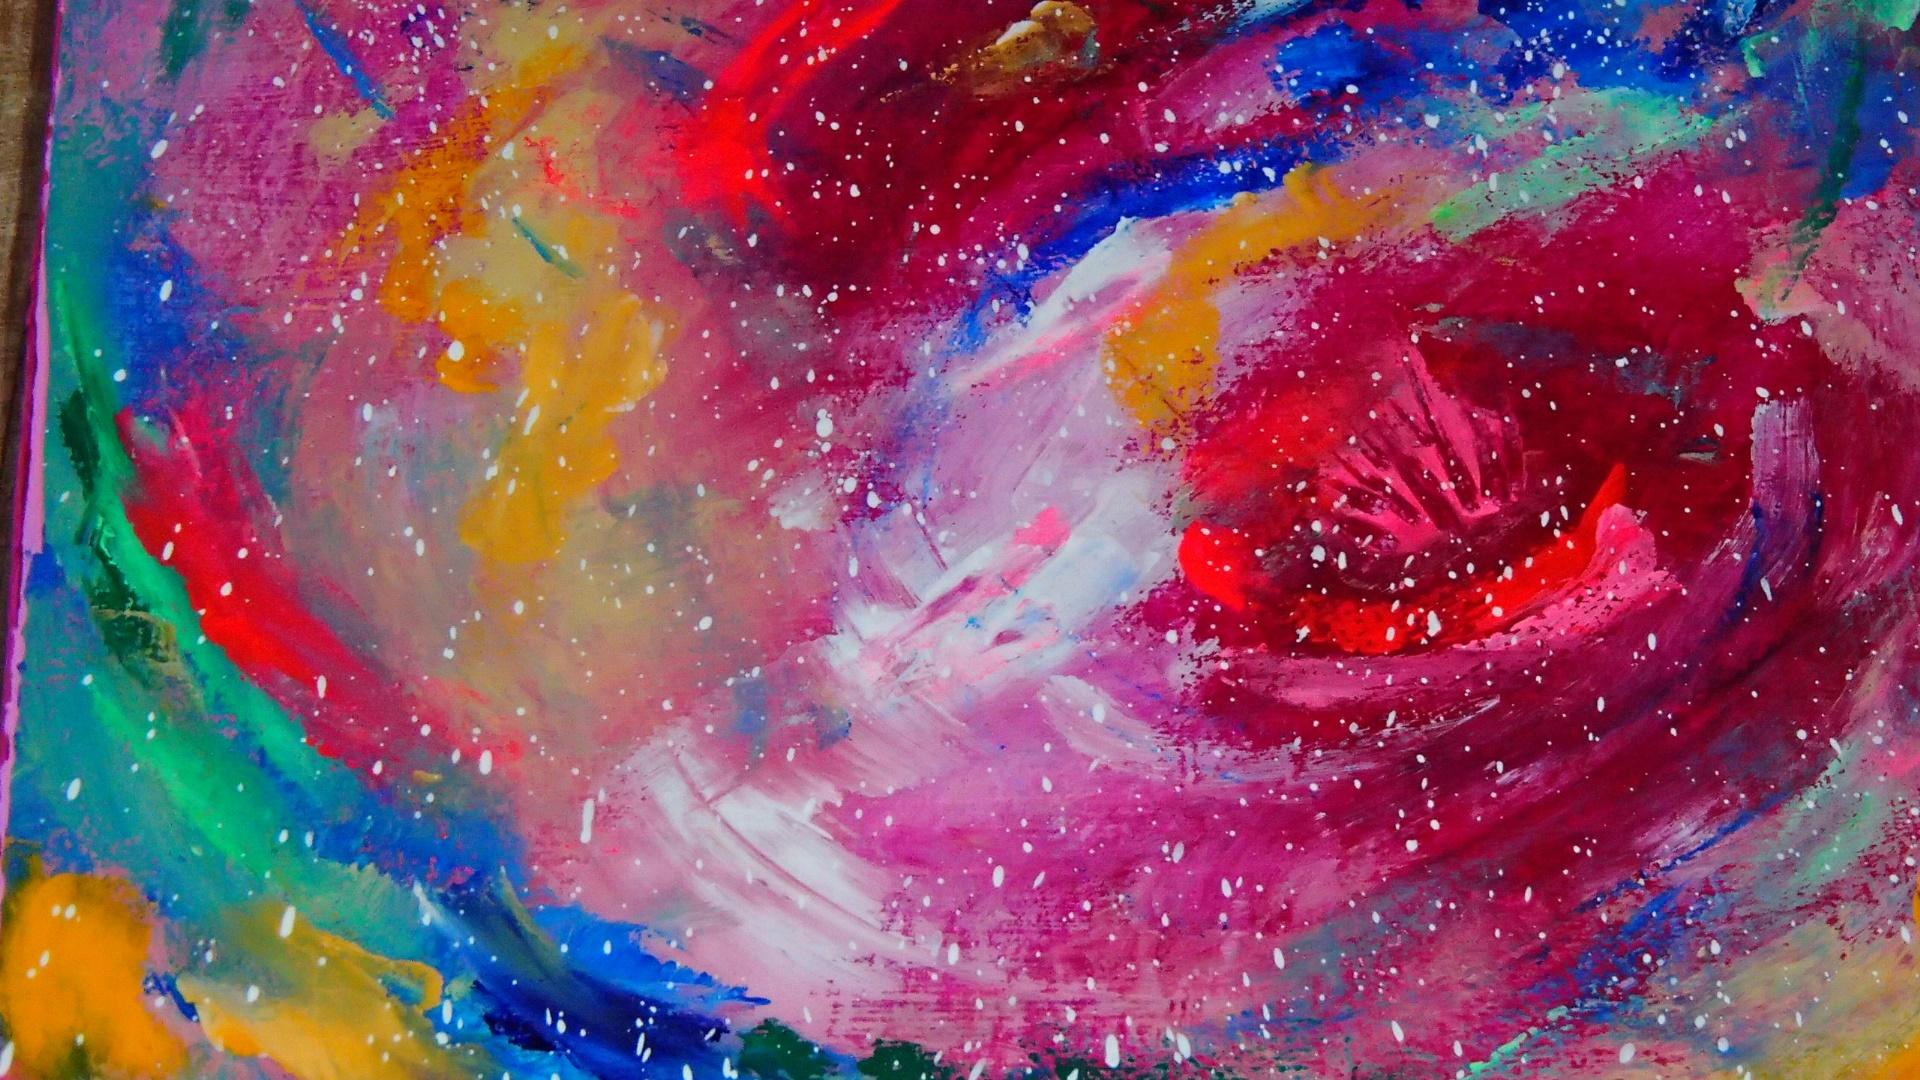 colorful swirl wallpaper